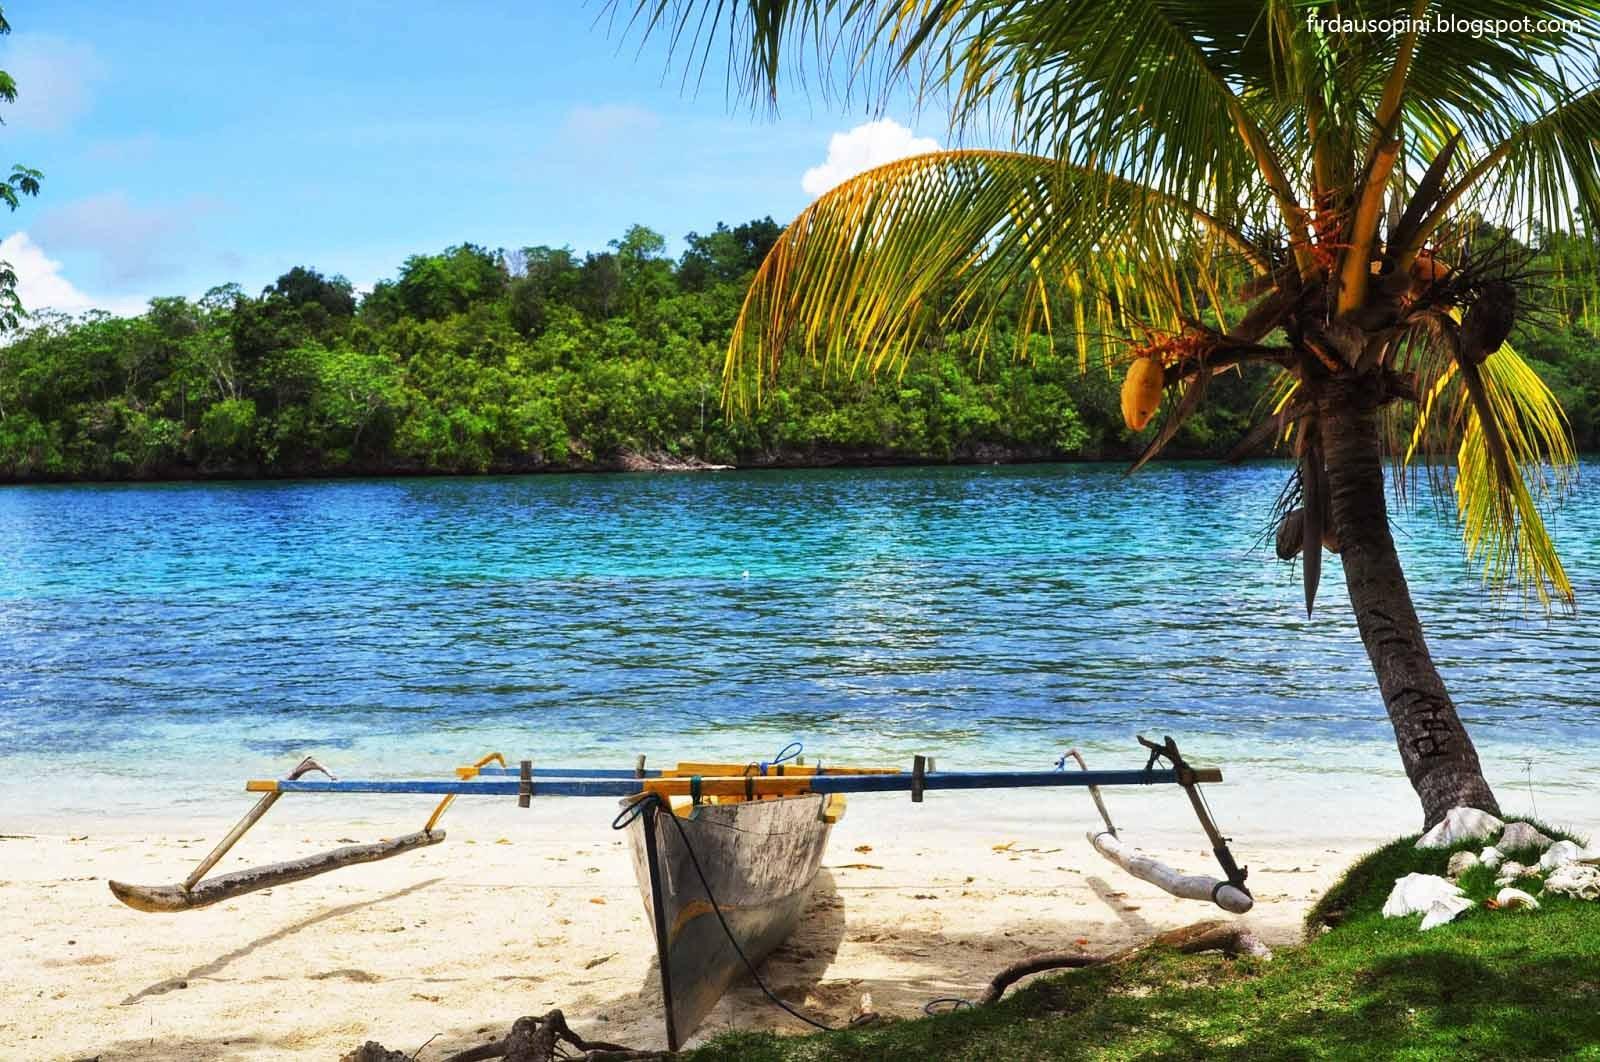 Tempat Wisata Gorontalo Wajib Kunjungi Fjj Pantai Bolituhuo Dunu Kab